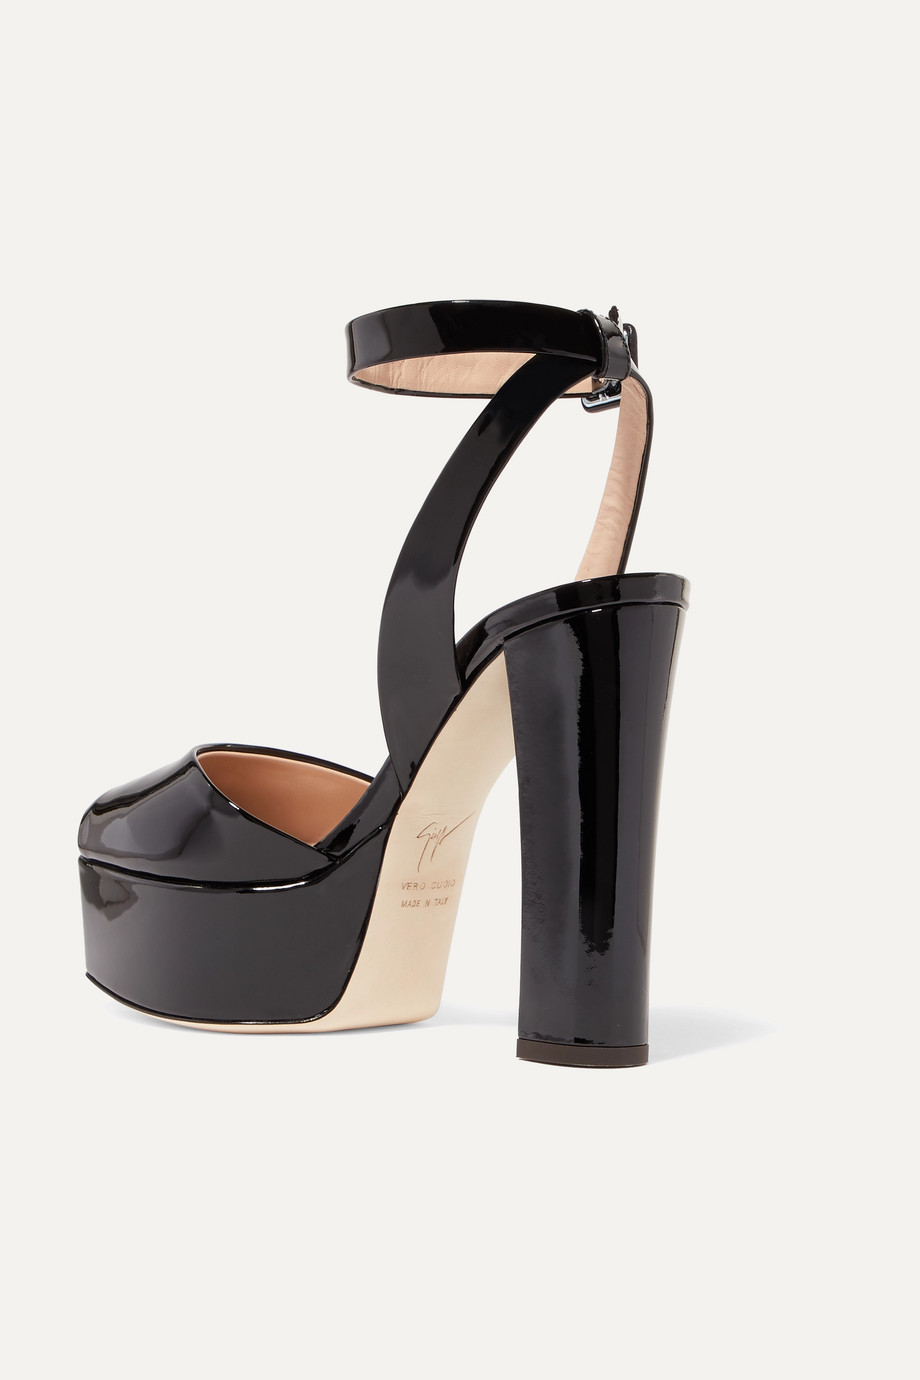 5296fe69e8b4 Giuseppe Zanotti Betty patent-leather platform sandals